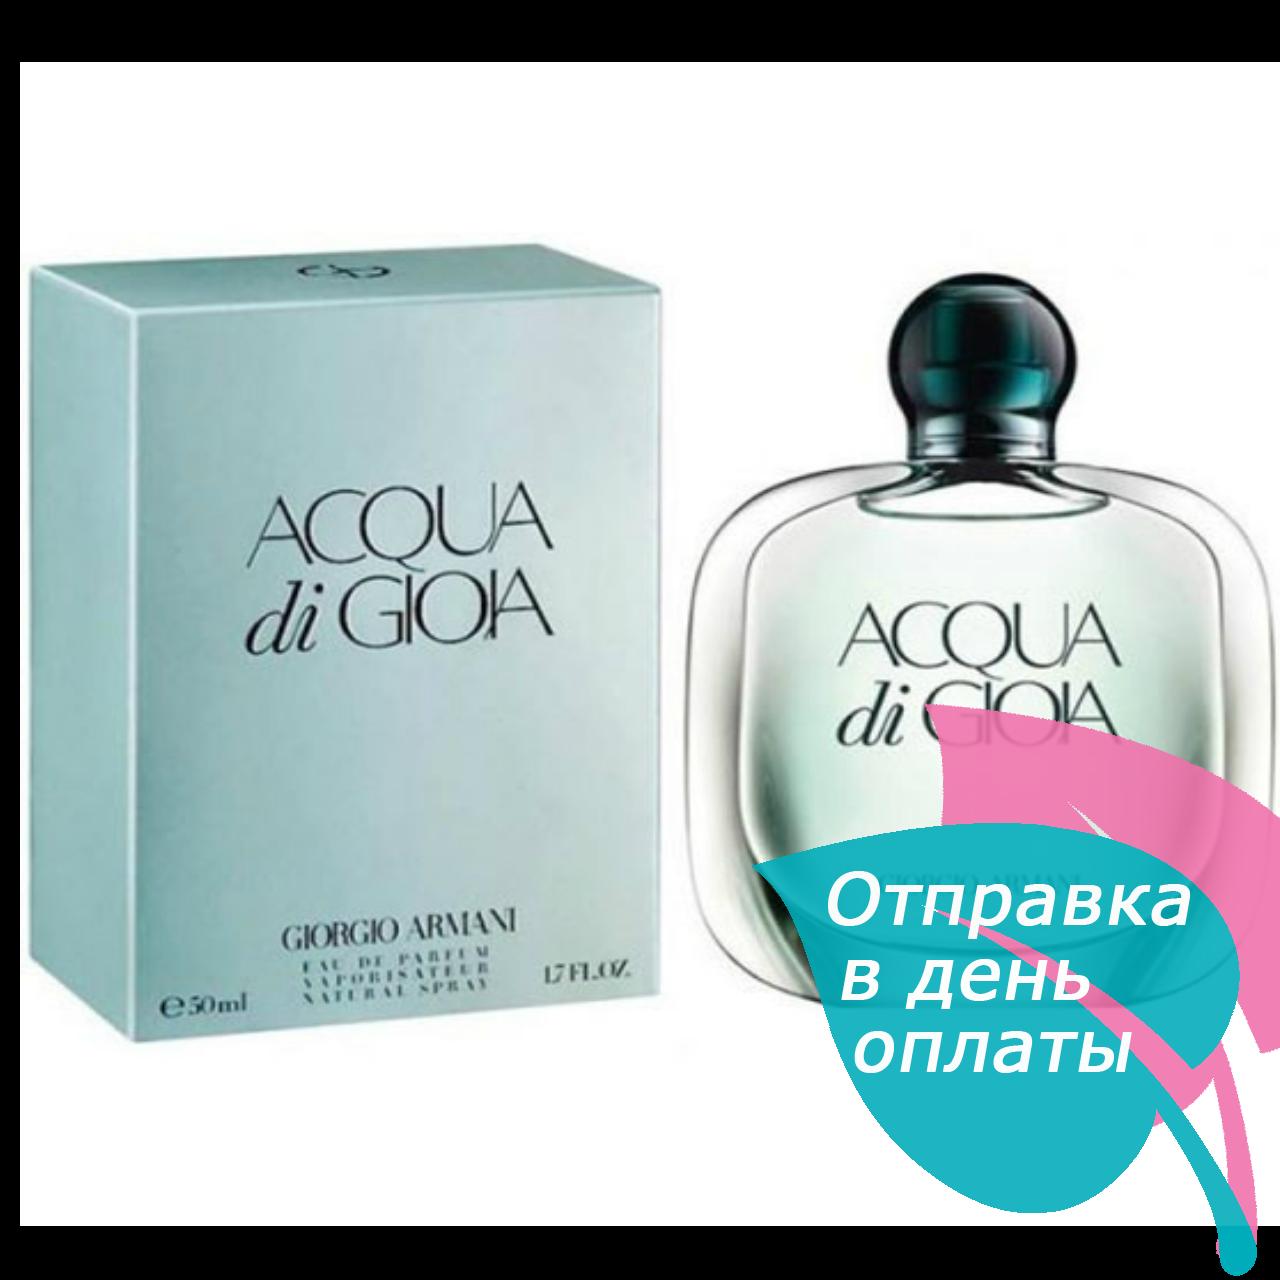 Парфюмированная вода для женщин Giorgio Armani Acqua di Gioia, 100 мл